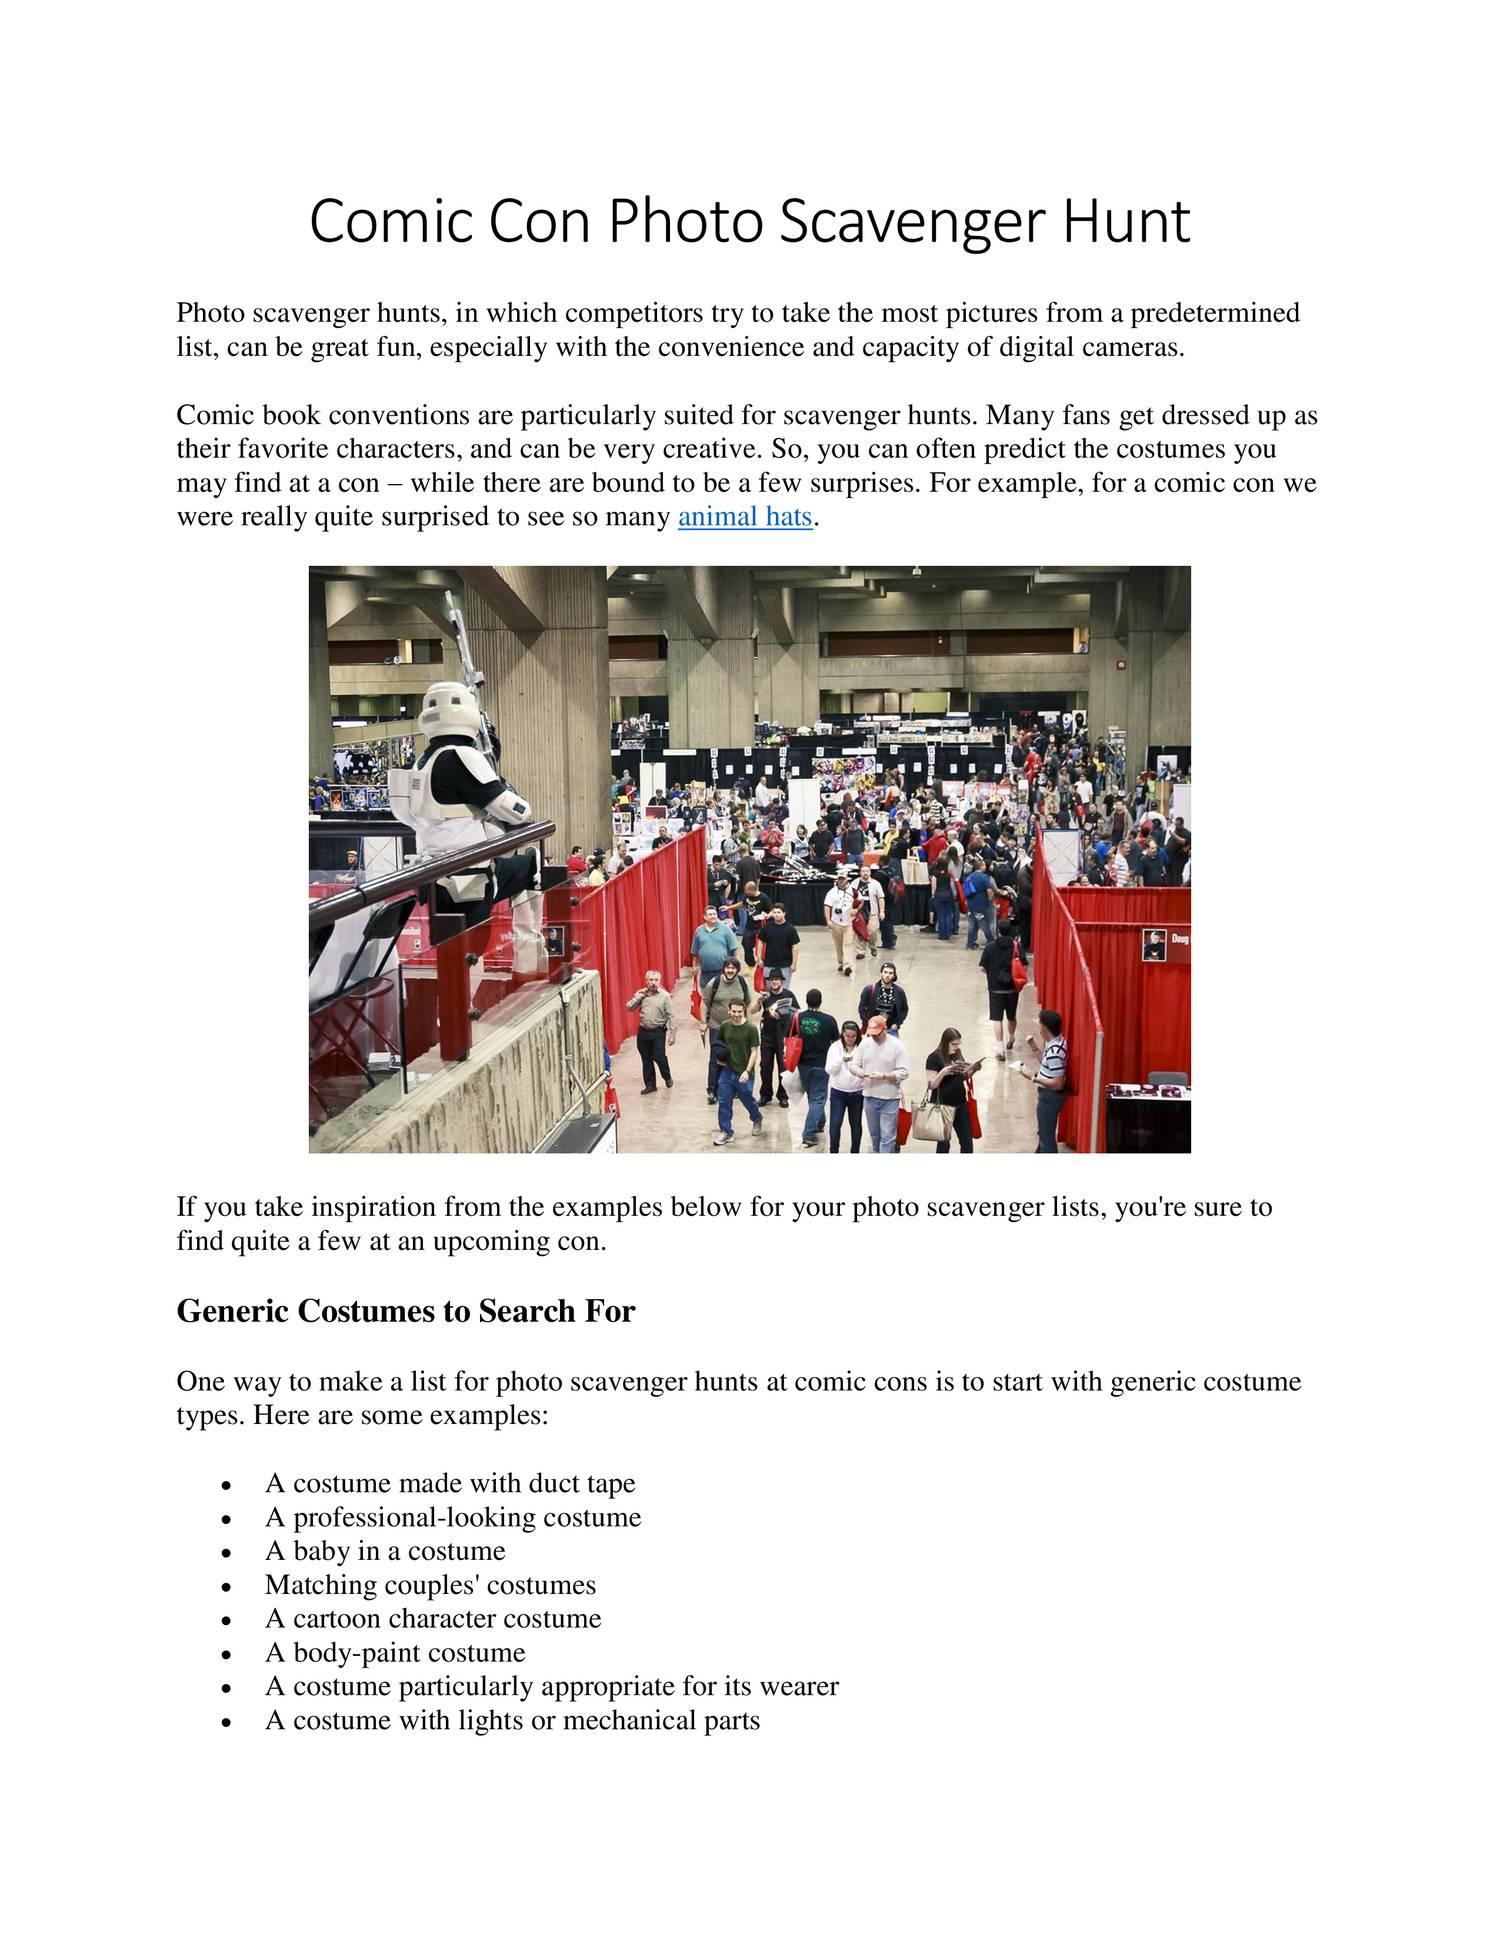 Comic Con Photo Scavenger Hunt pdf   DocDroid